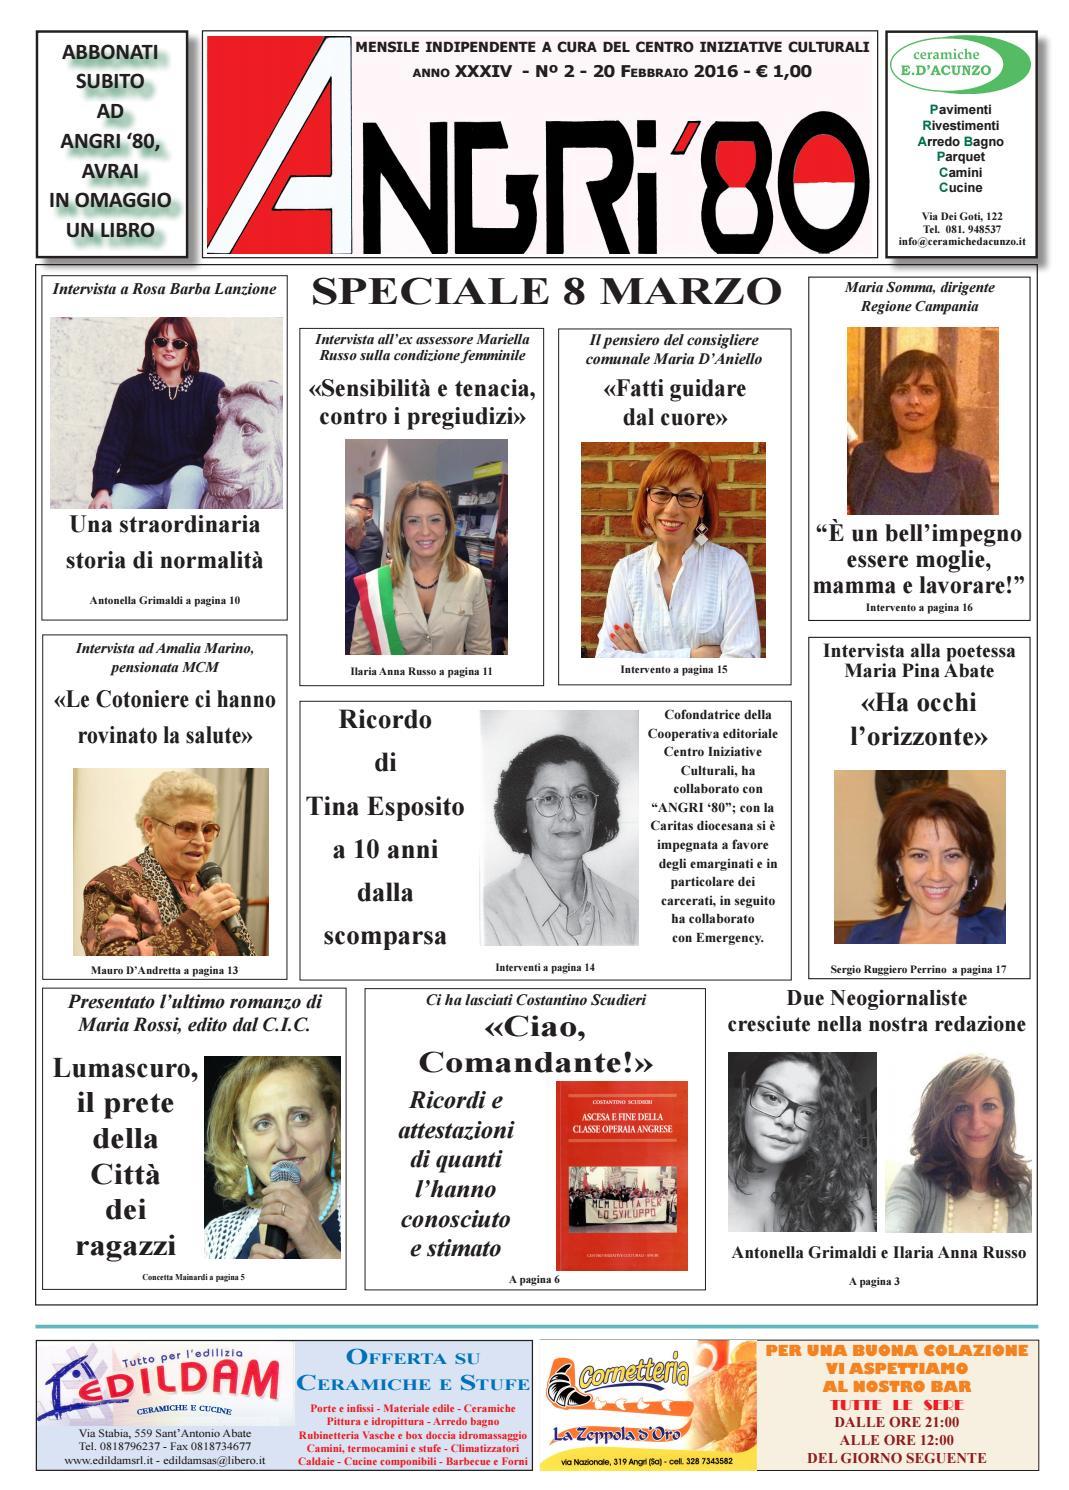 angri 80 febbraio 2016finito by lombardi antonio - issuu - Arredo Bagno Angri